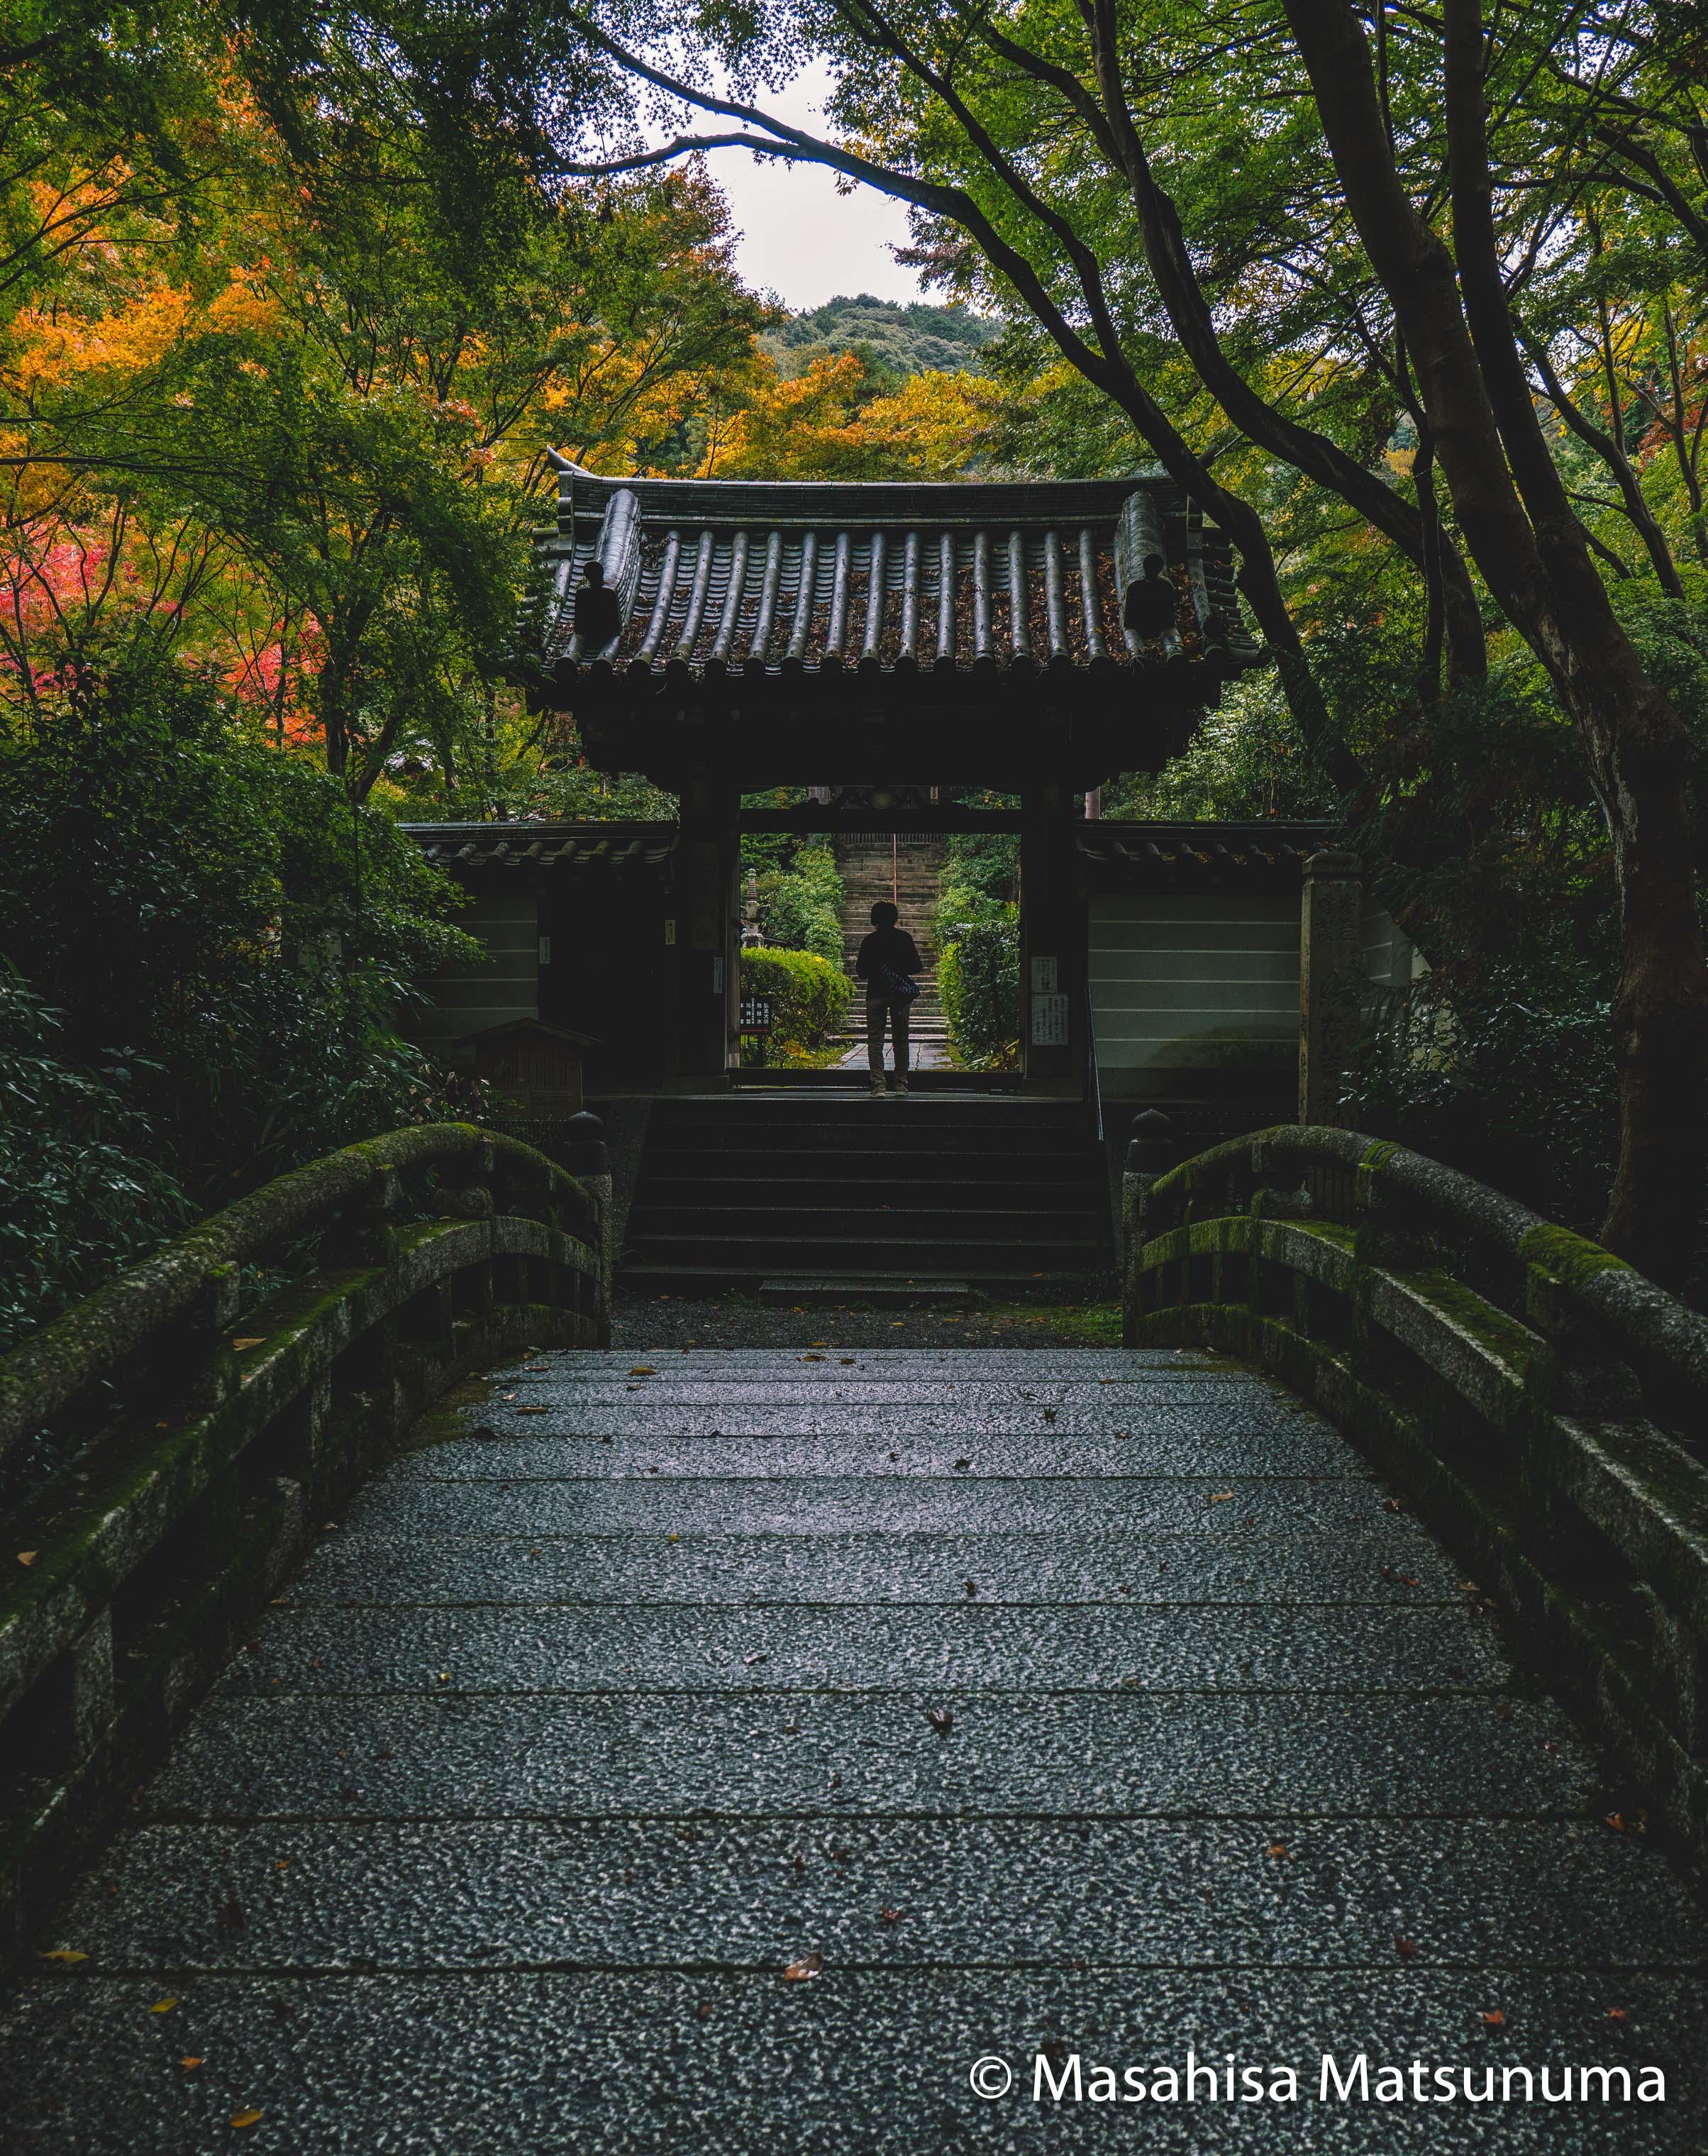 Sennyu-ji Kyoto 来迎院 泉涌寺 京都